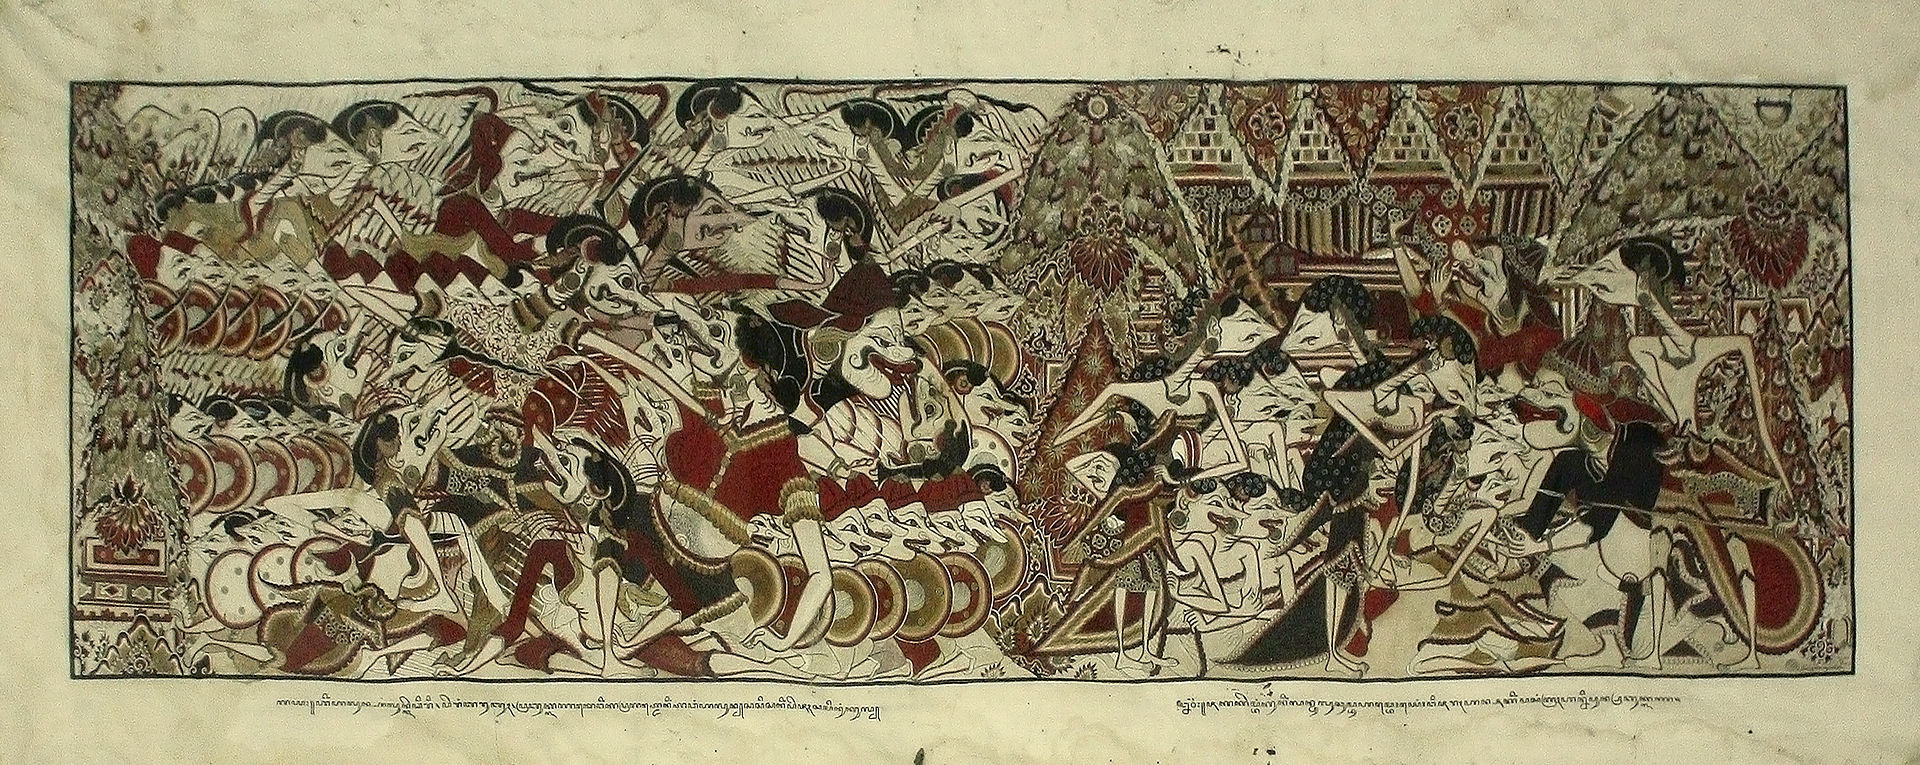 Wayang Beber, Wayang Nusantara yang Hampir Punah